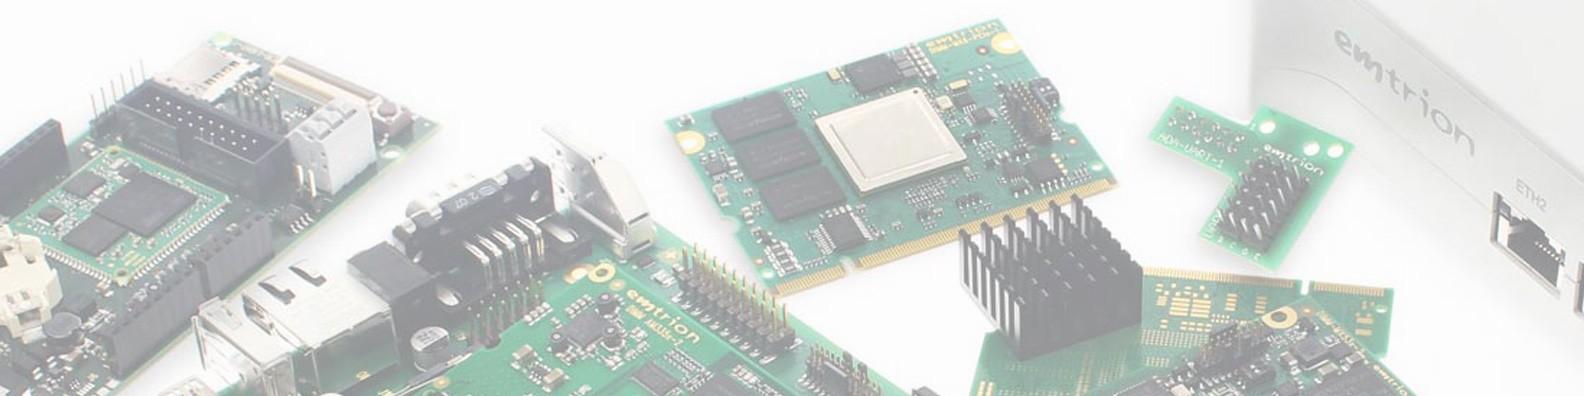 emtrion GmbH - embedded systems | LinkedIn